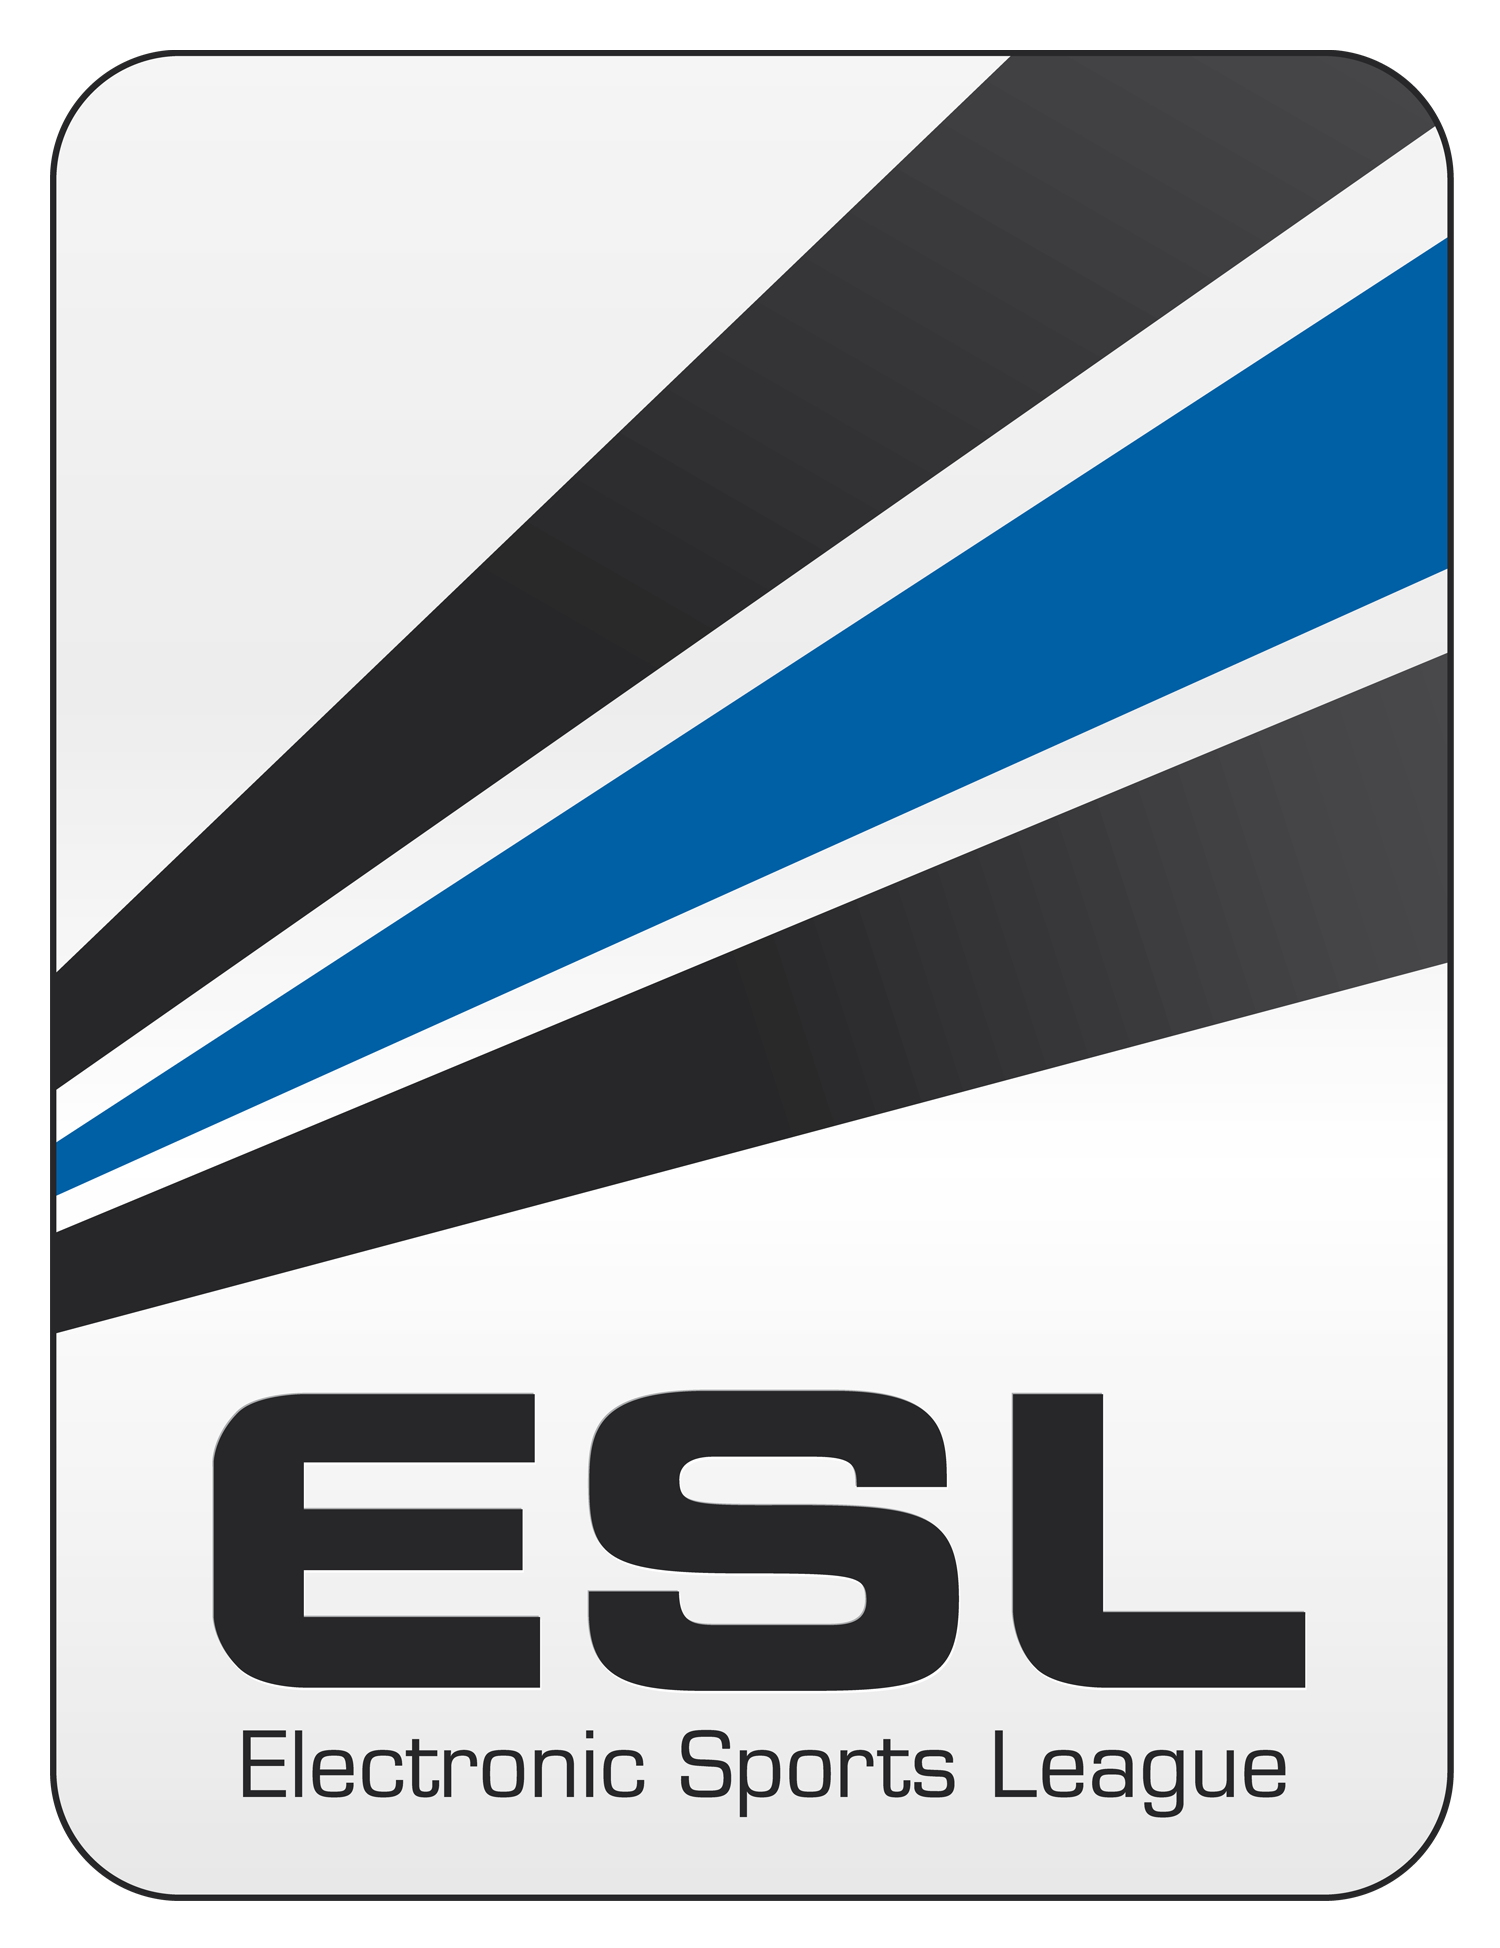 esl-logo.jpg